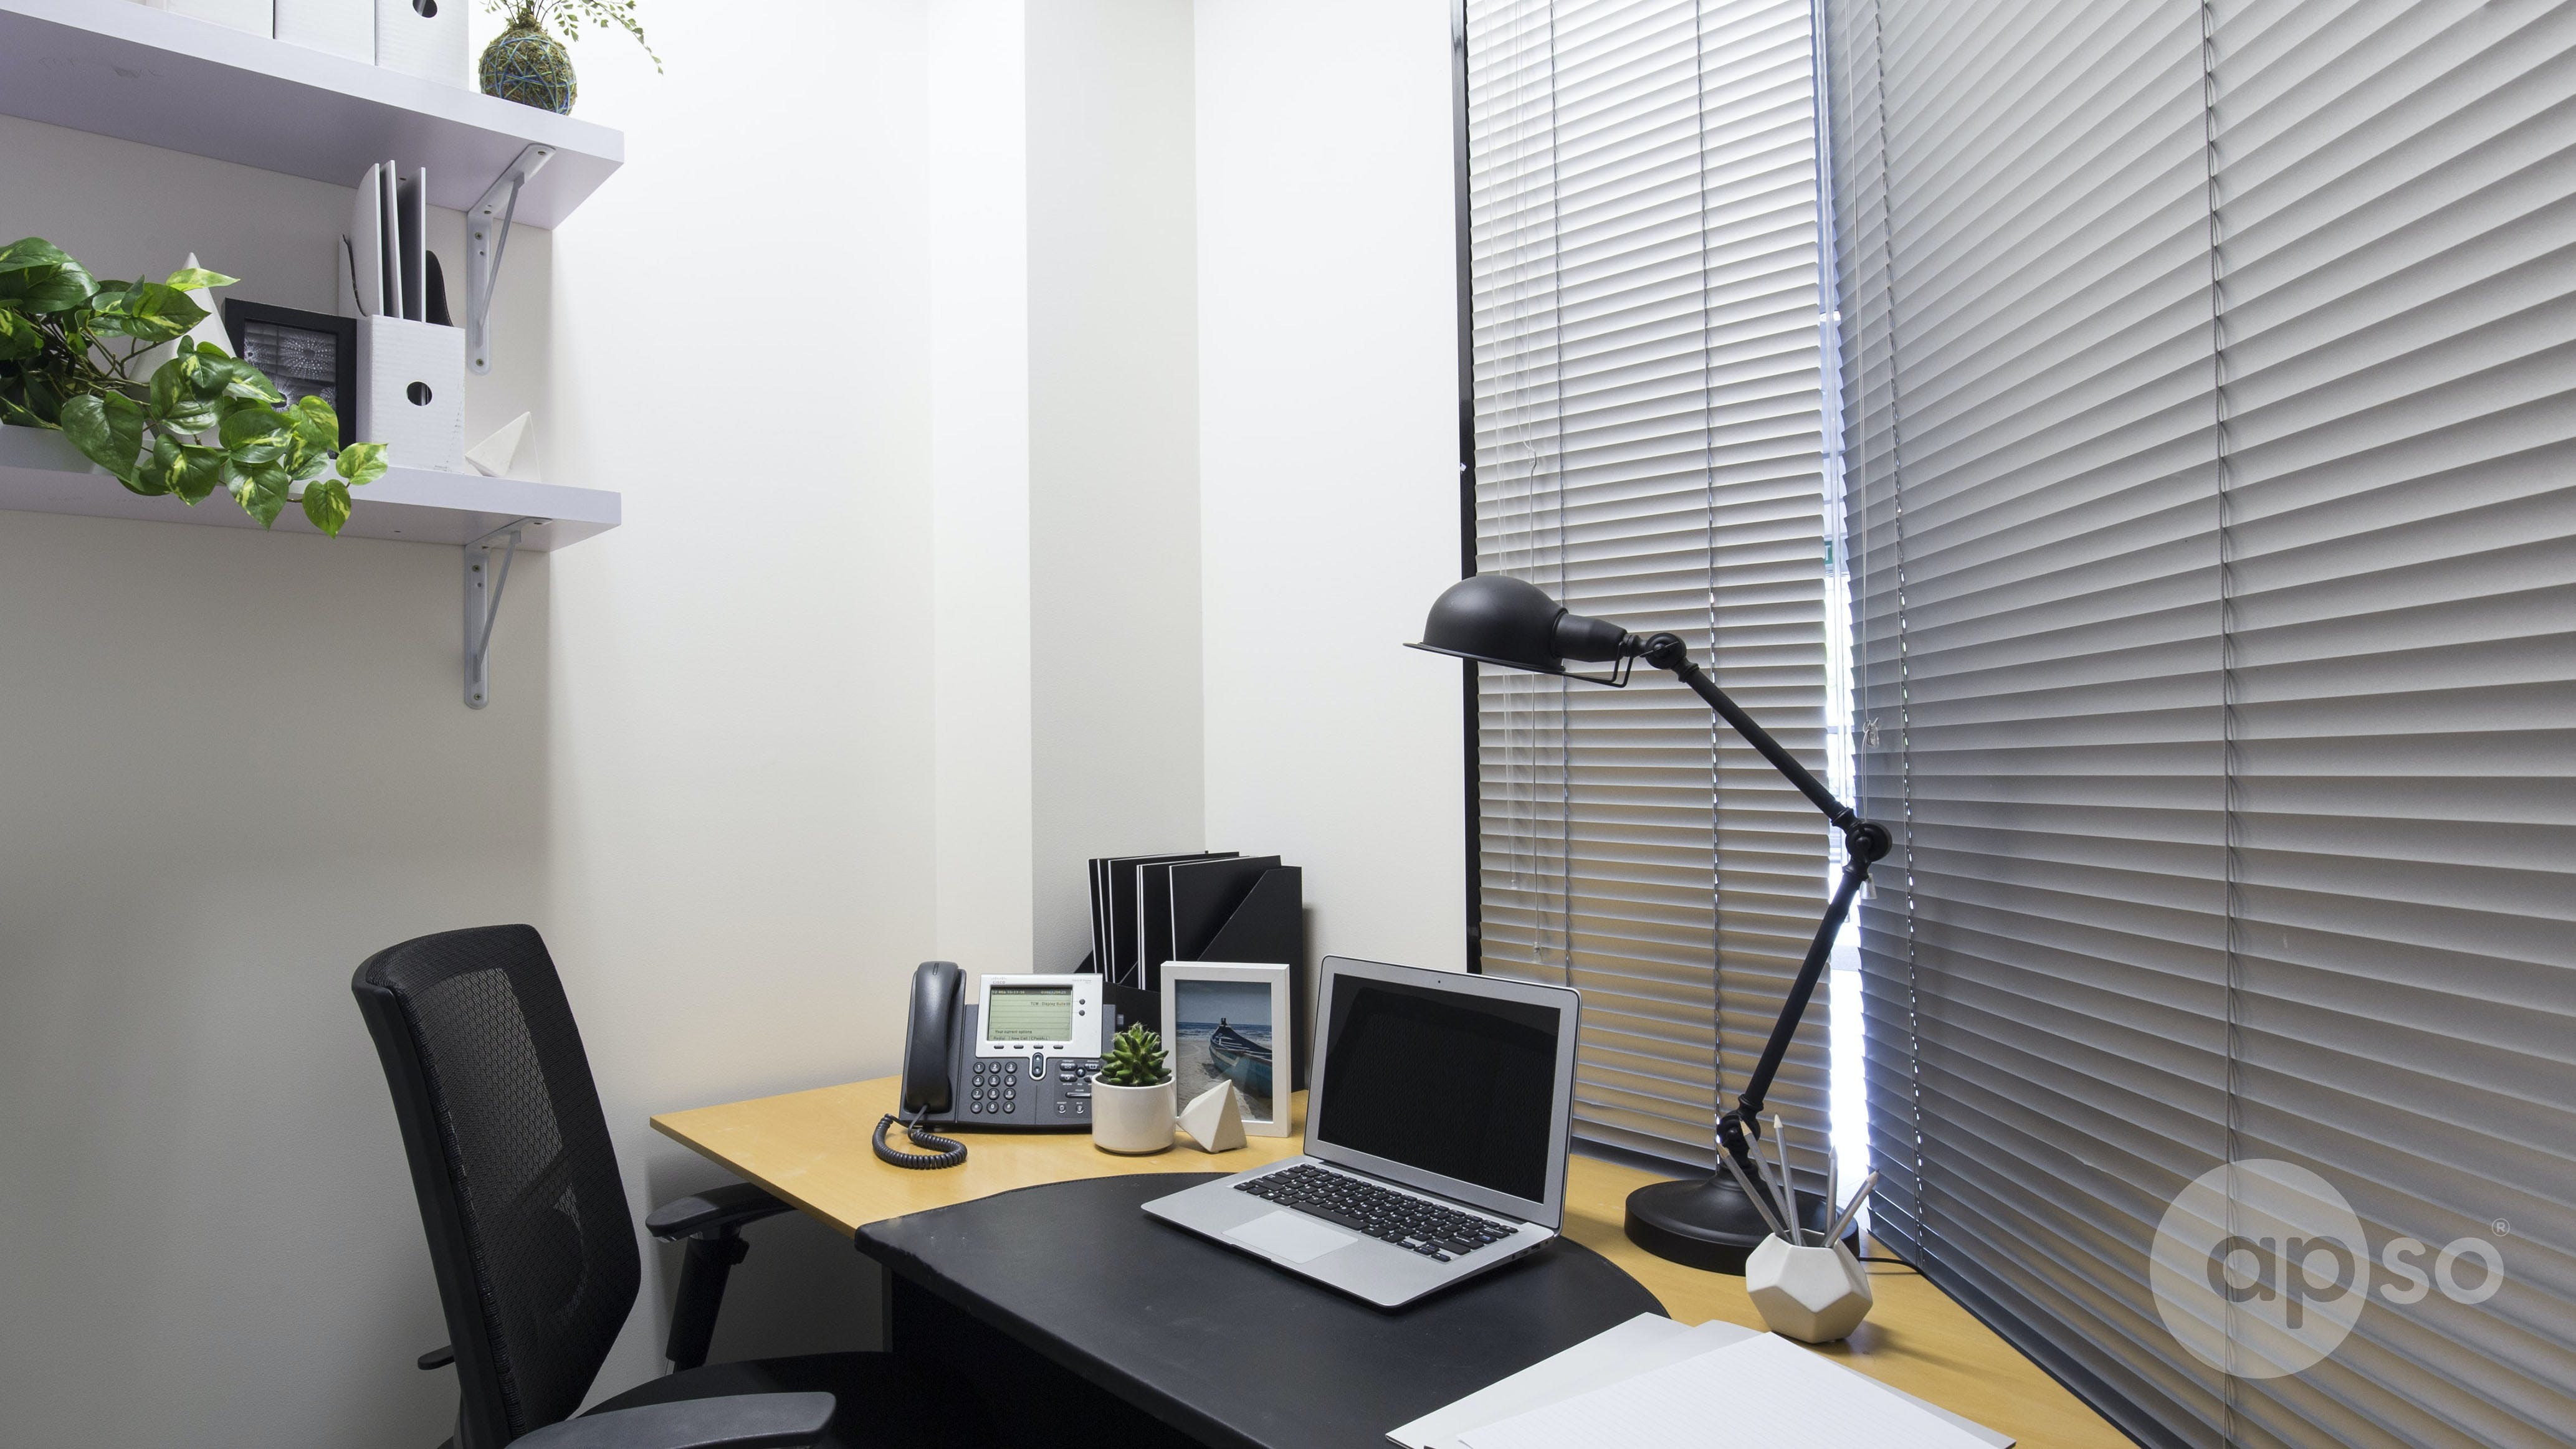 Suite 222d, private office at Toorak Corporate, image 1